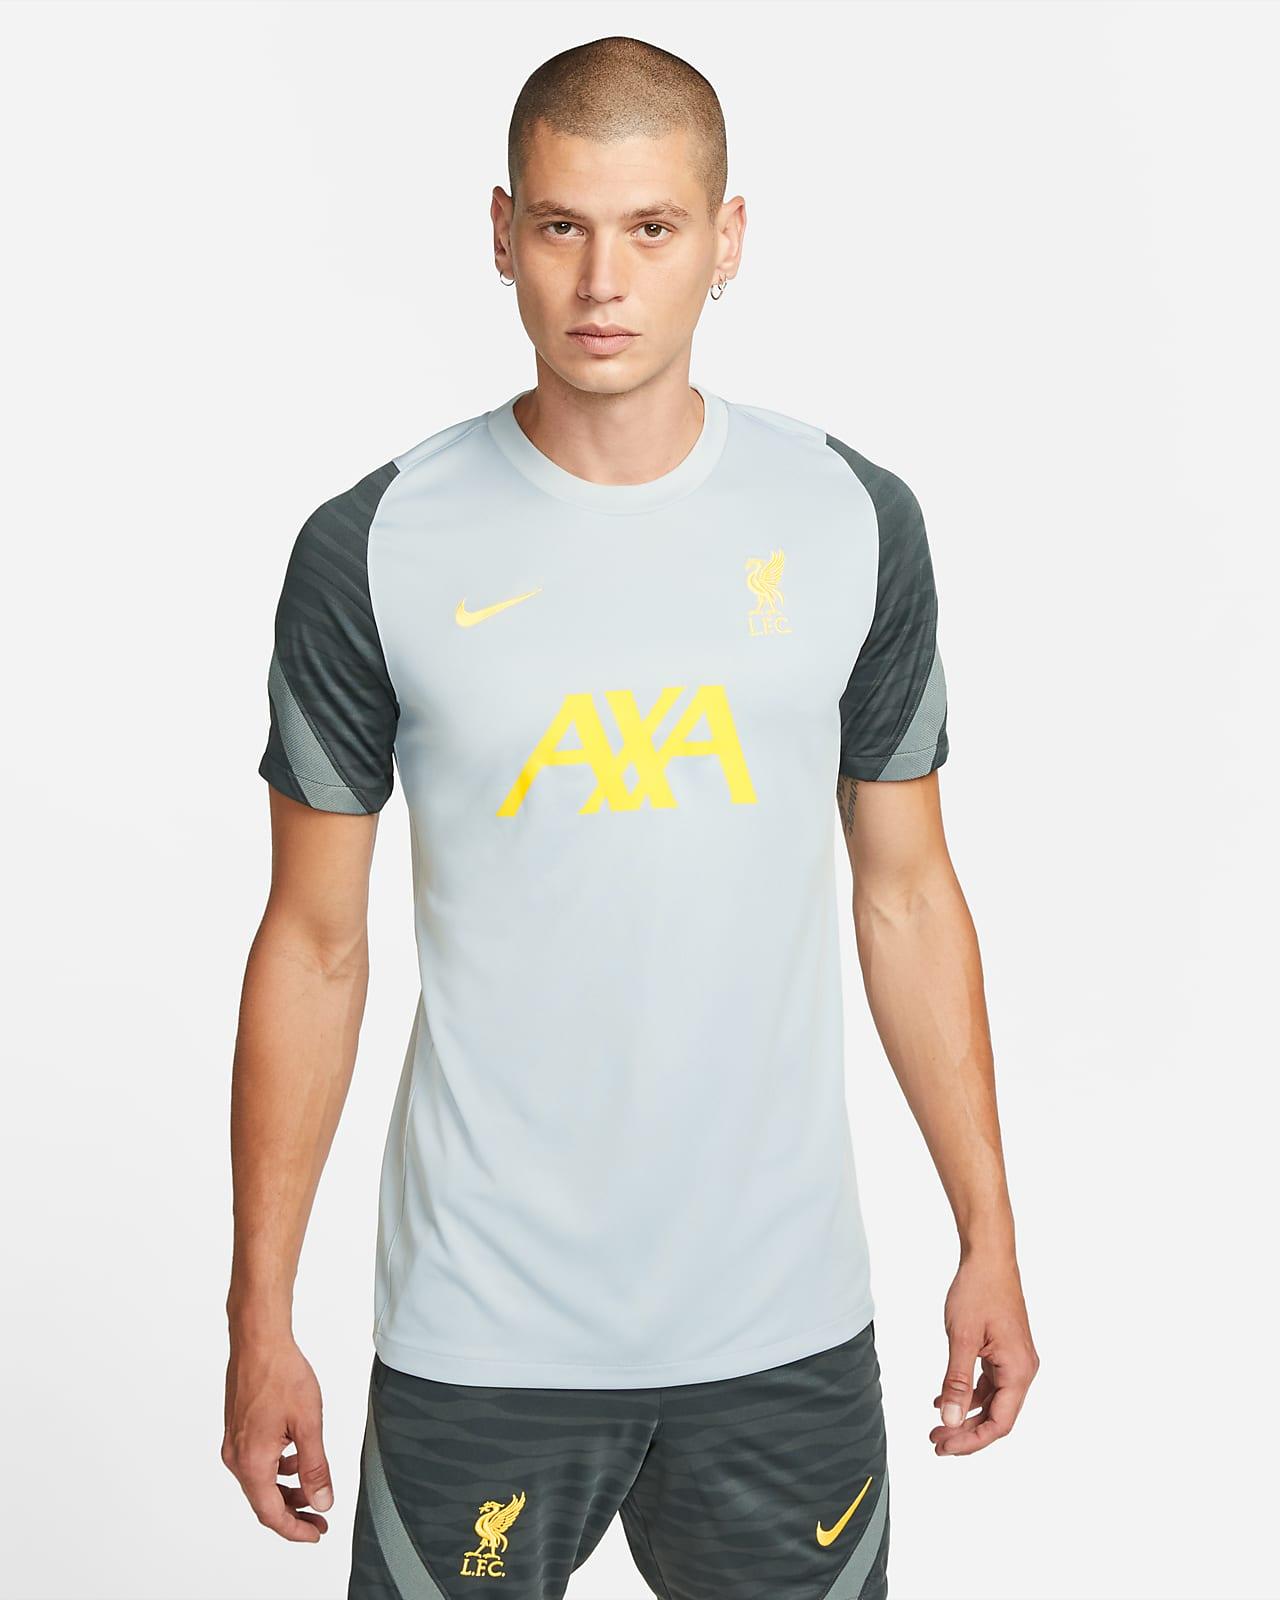 Liverpool F.C. Strike Men's Nike Dri-FIT Short-Sleeve Football Top